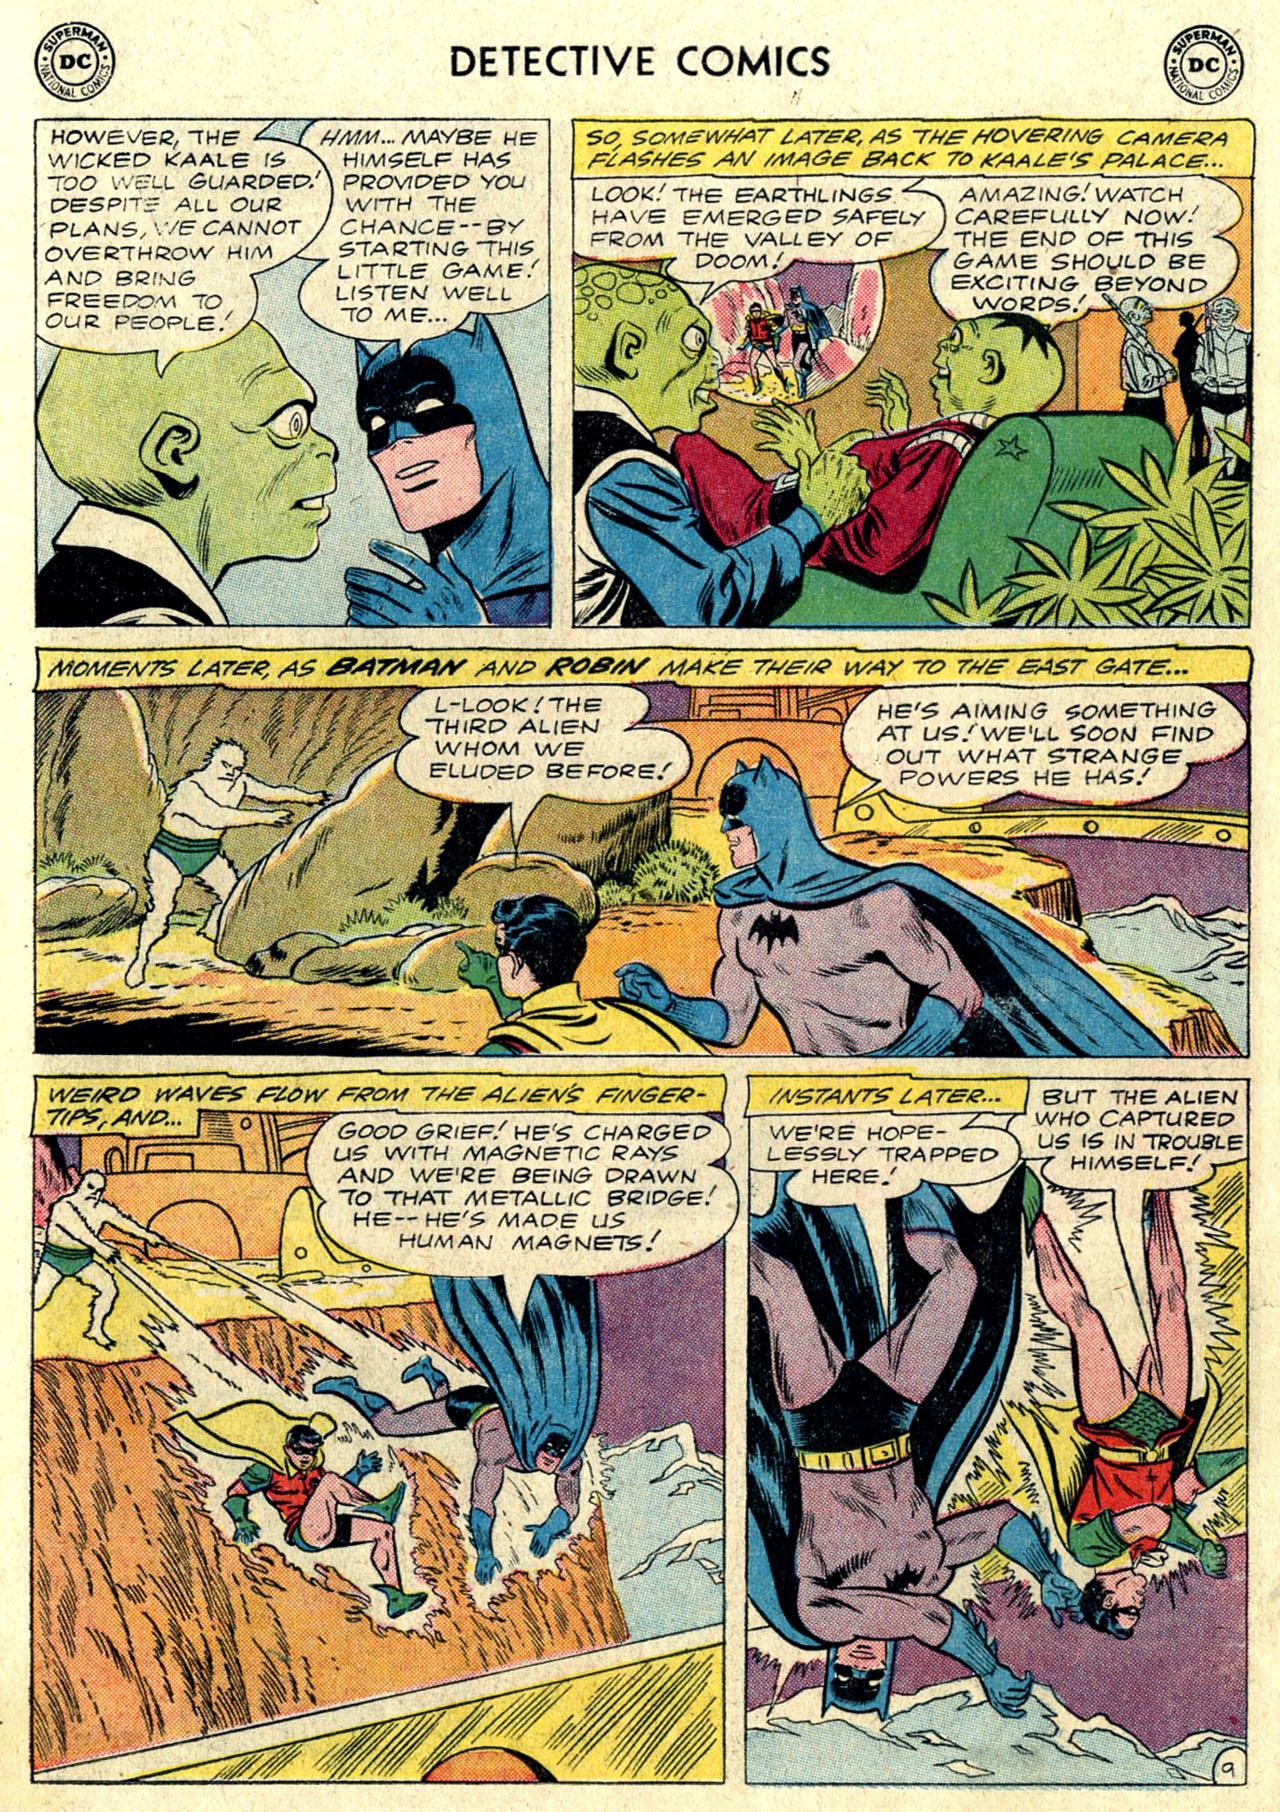 Detective Comics (1937) 299 Page 10